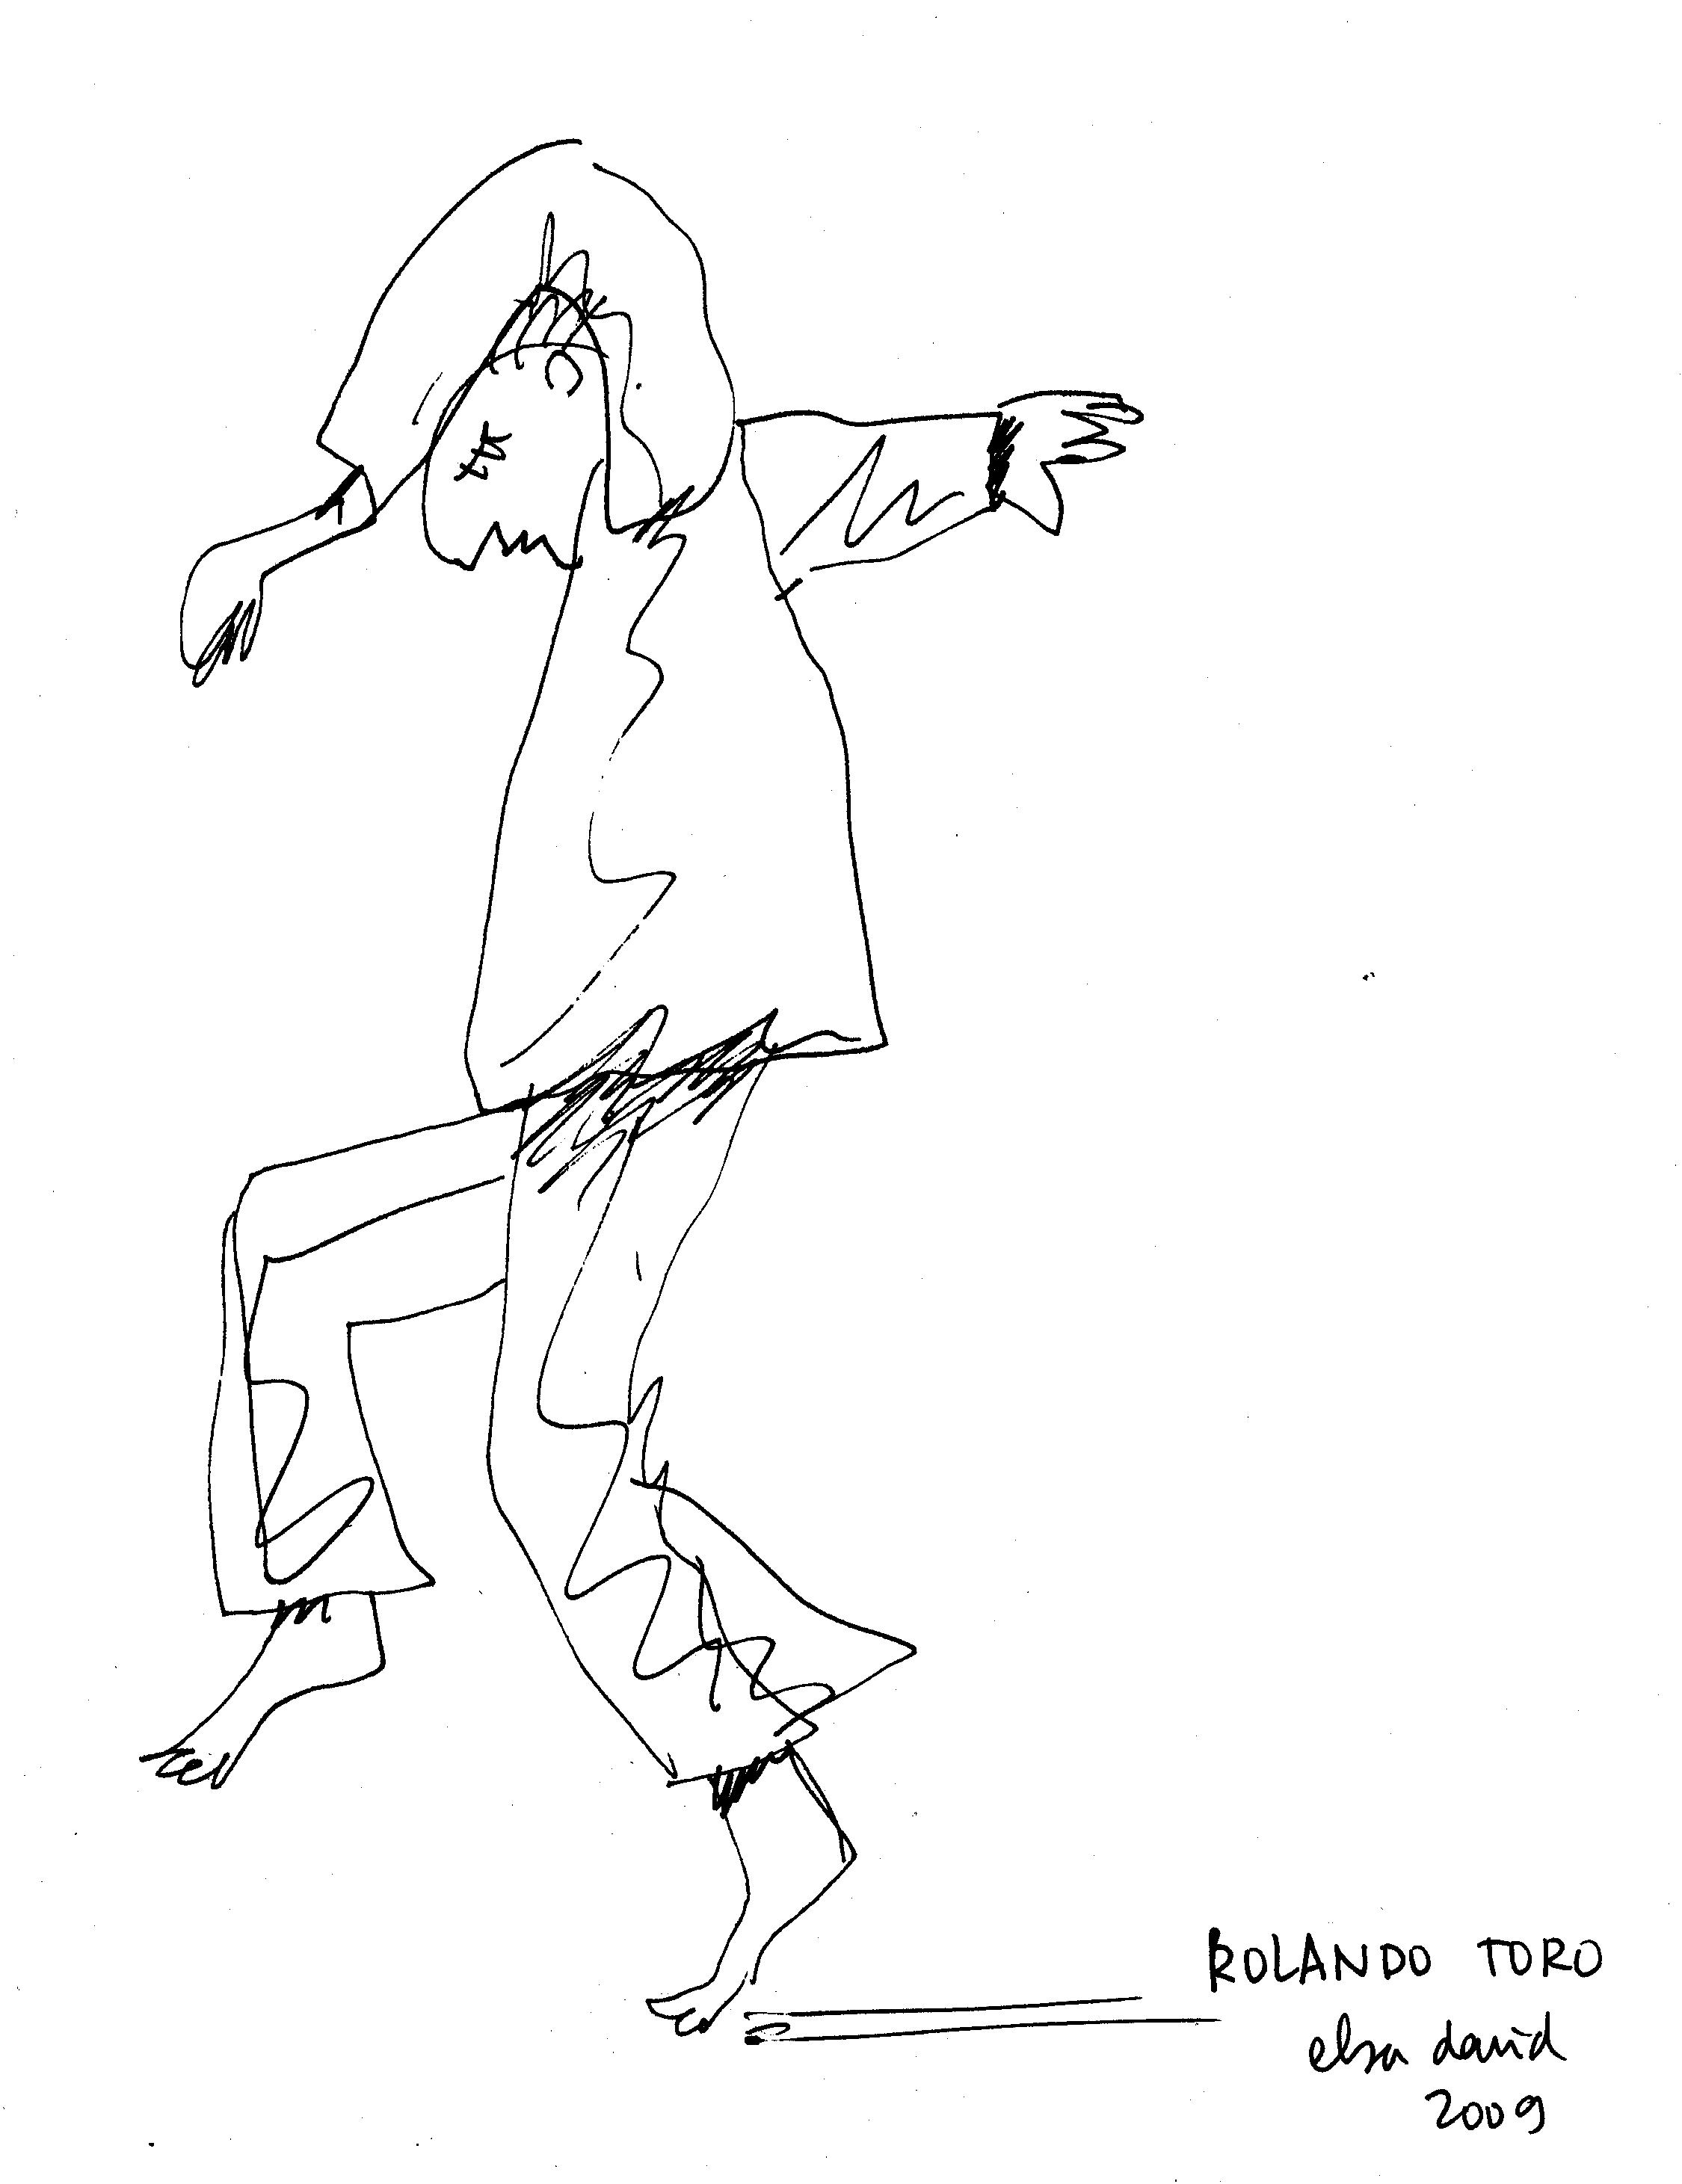 rolando-toro.png